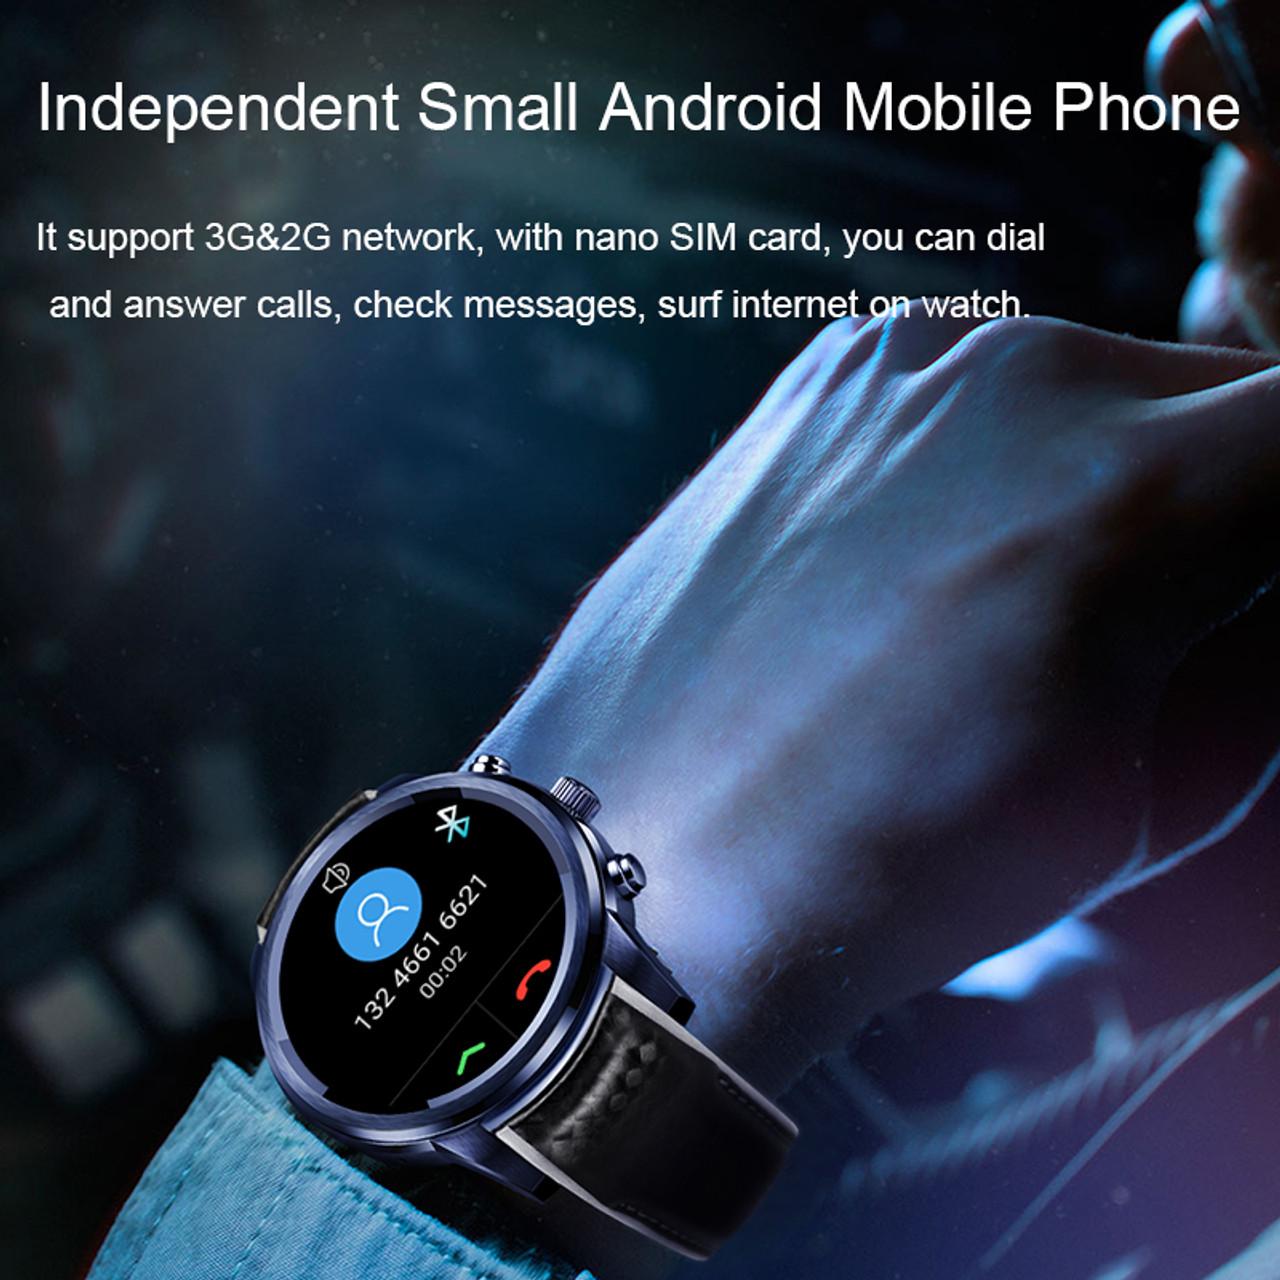 429f8cff794 ... LEMFO LEM5 Pro Smart Watch Phone Android 5.1 2GB + 16GB Support SIM  card GPS WiFi ...